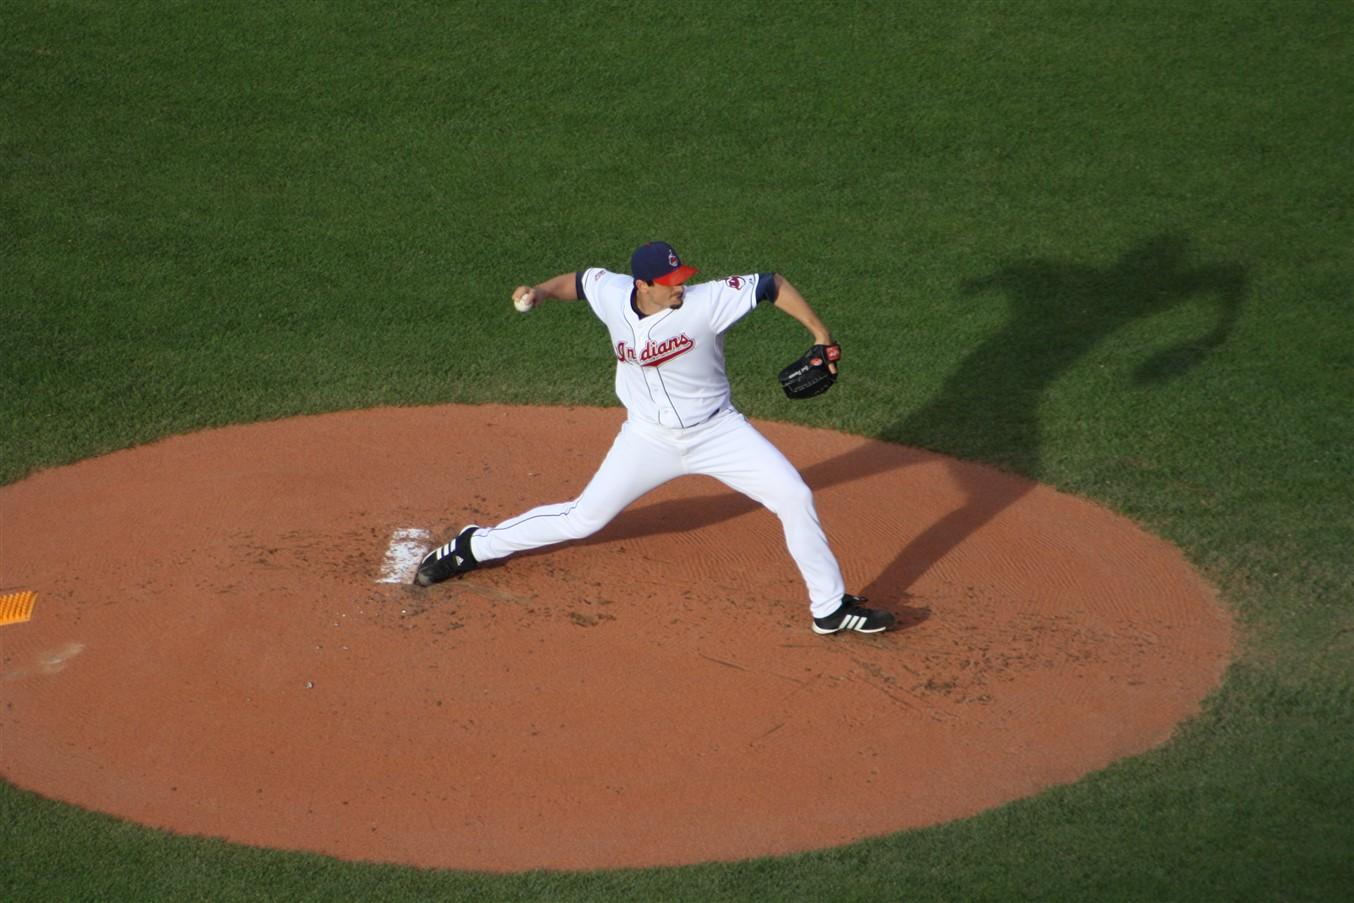 2009 06 15 Cleveland Indians 6.jpg